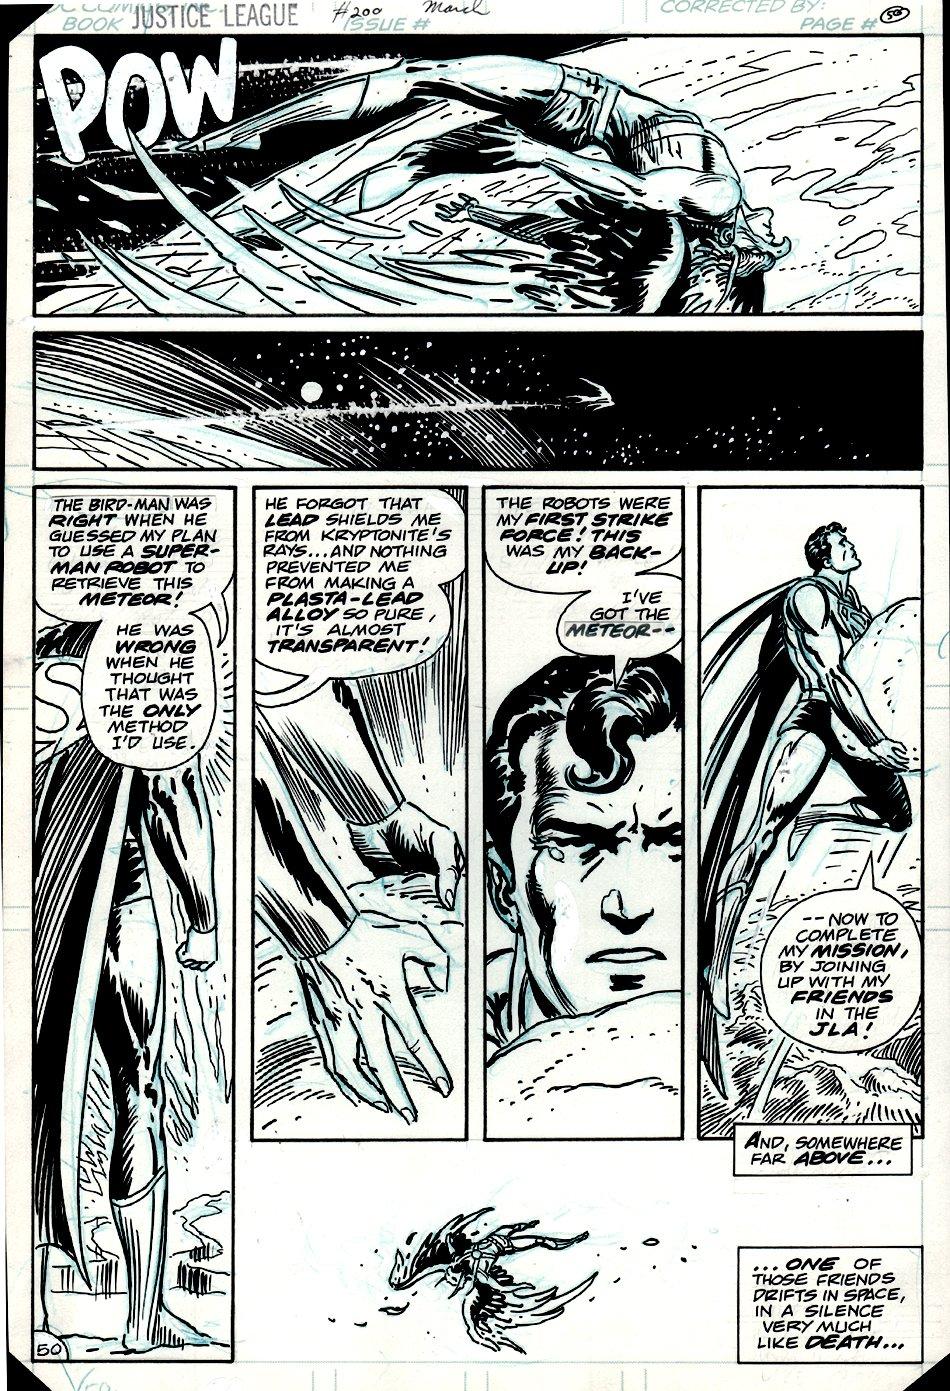 Justice League of America #200 p 50 (1981)